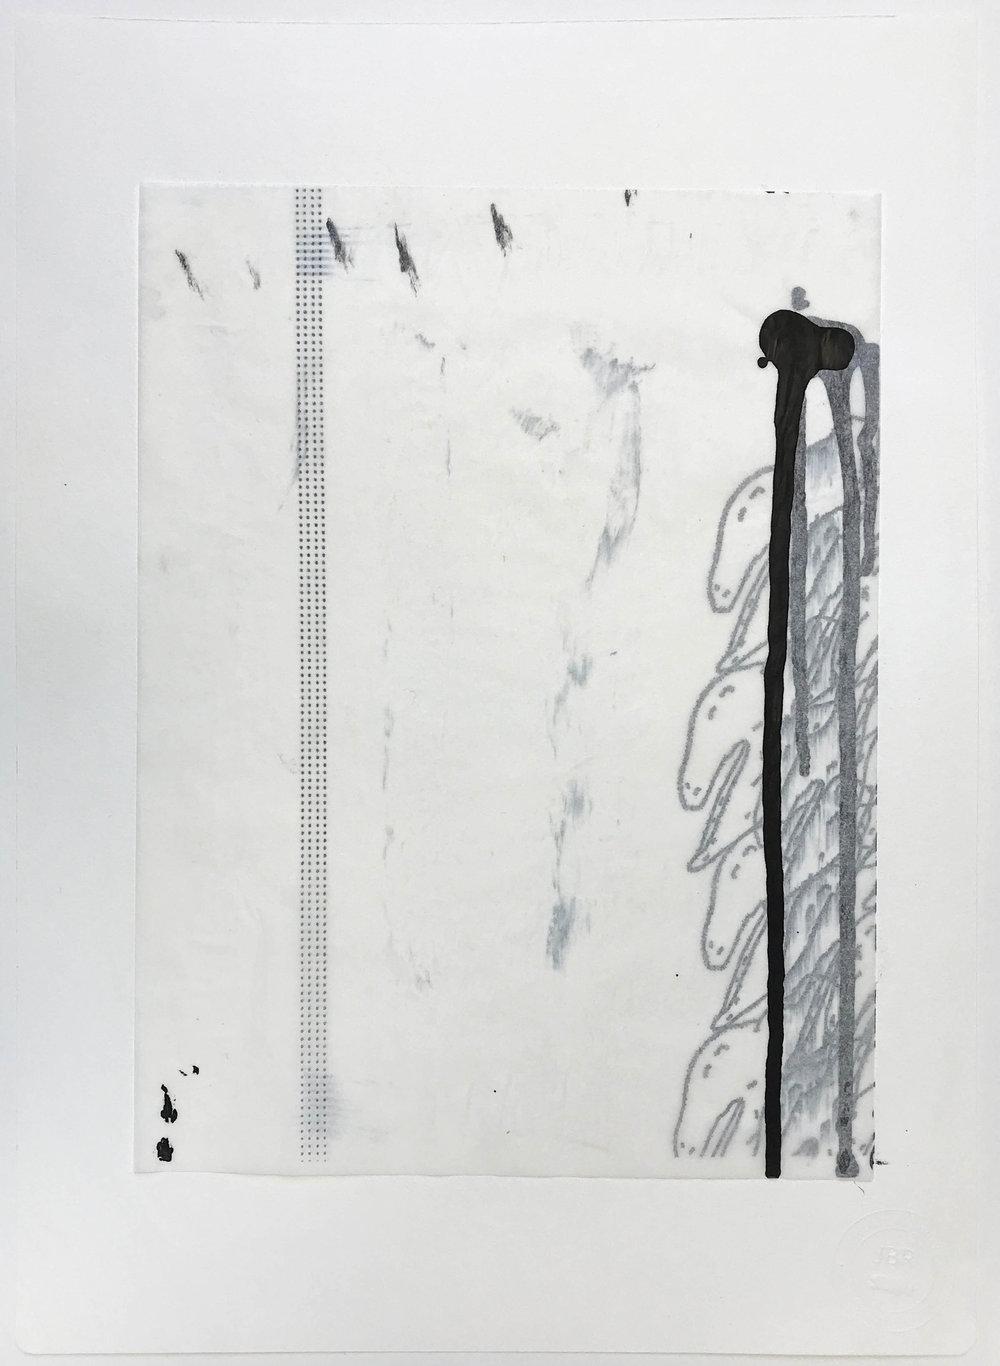 %22Grund%22- Técnica mixta  - 42 x 30 cm - Julián Brangold - 2018.jpg